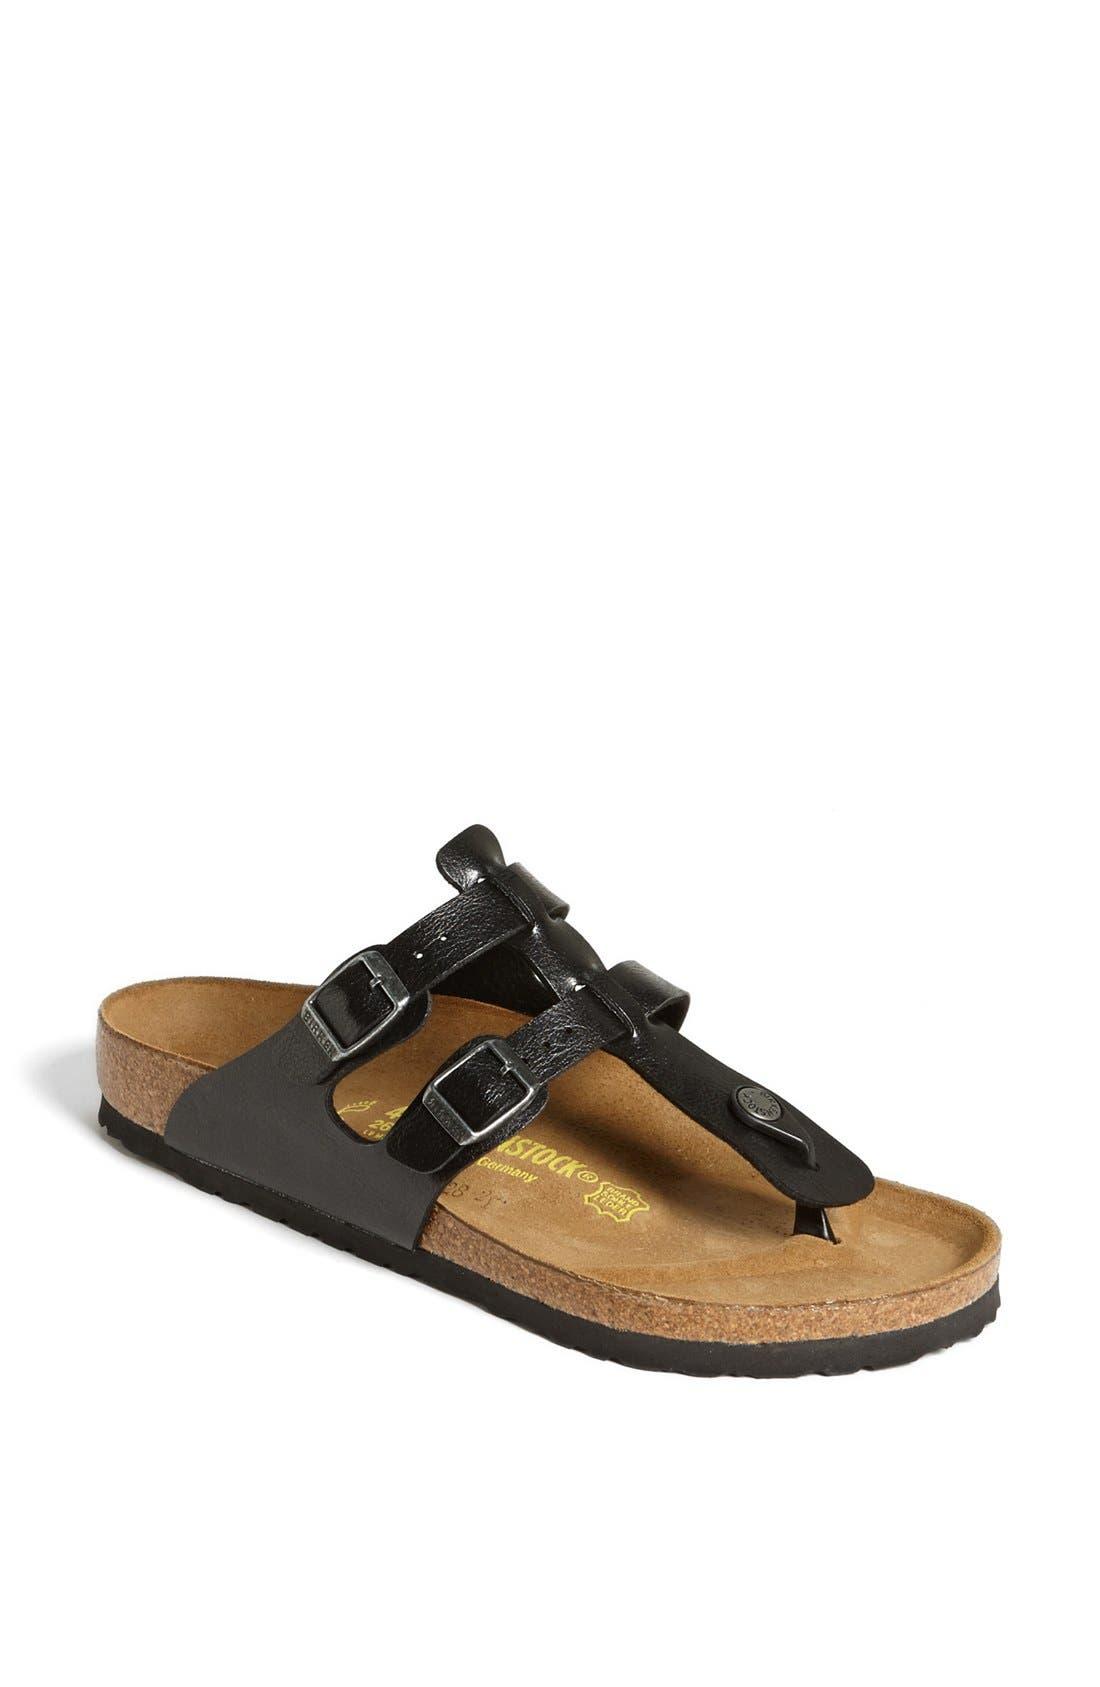 'Sparta' Birko-Flor<sup>™</sup> Sandal, Main, color, 001